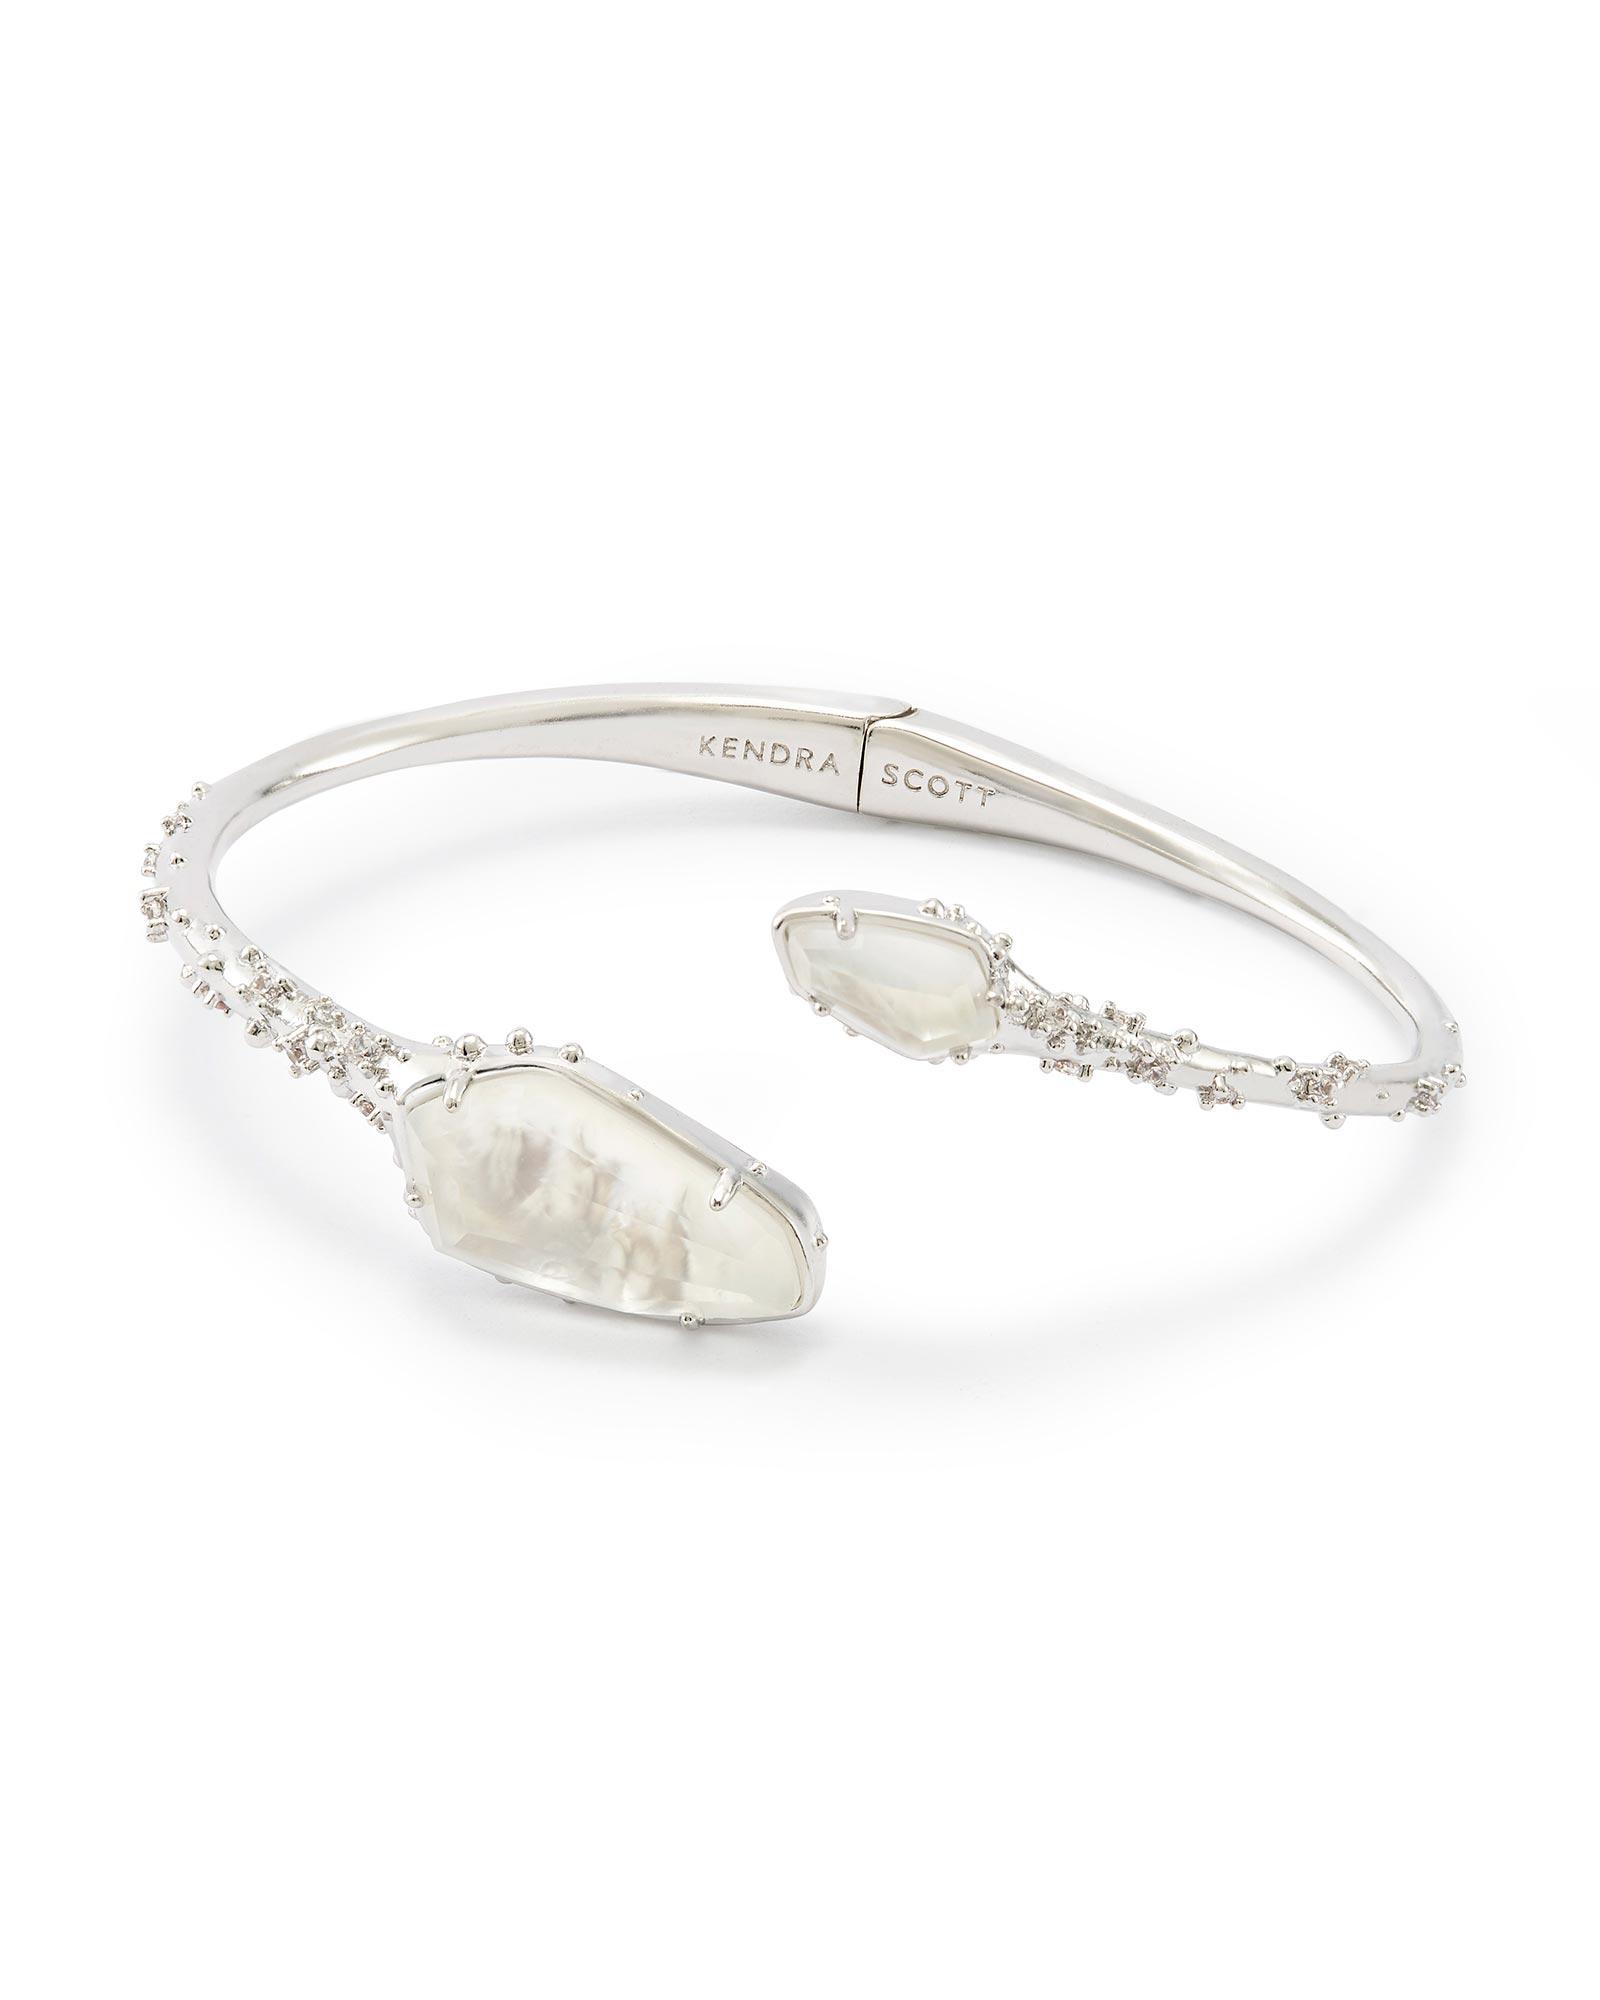 Zander Hinge Cuff Bracelet In Silver